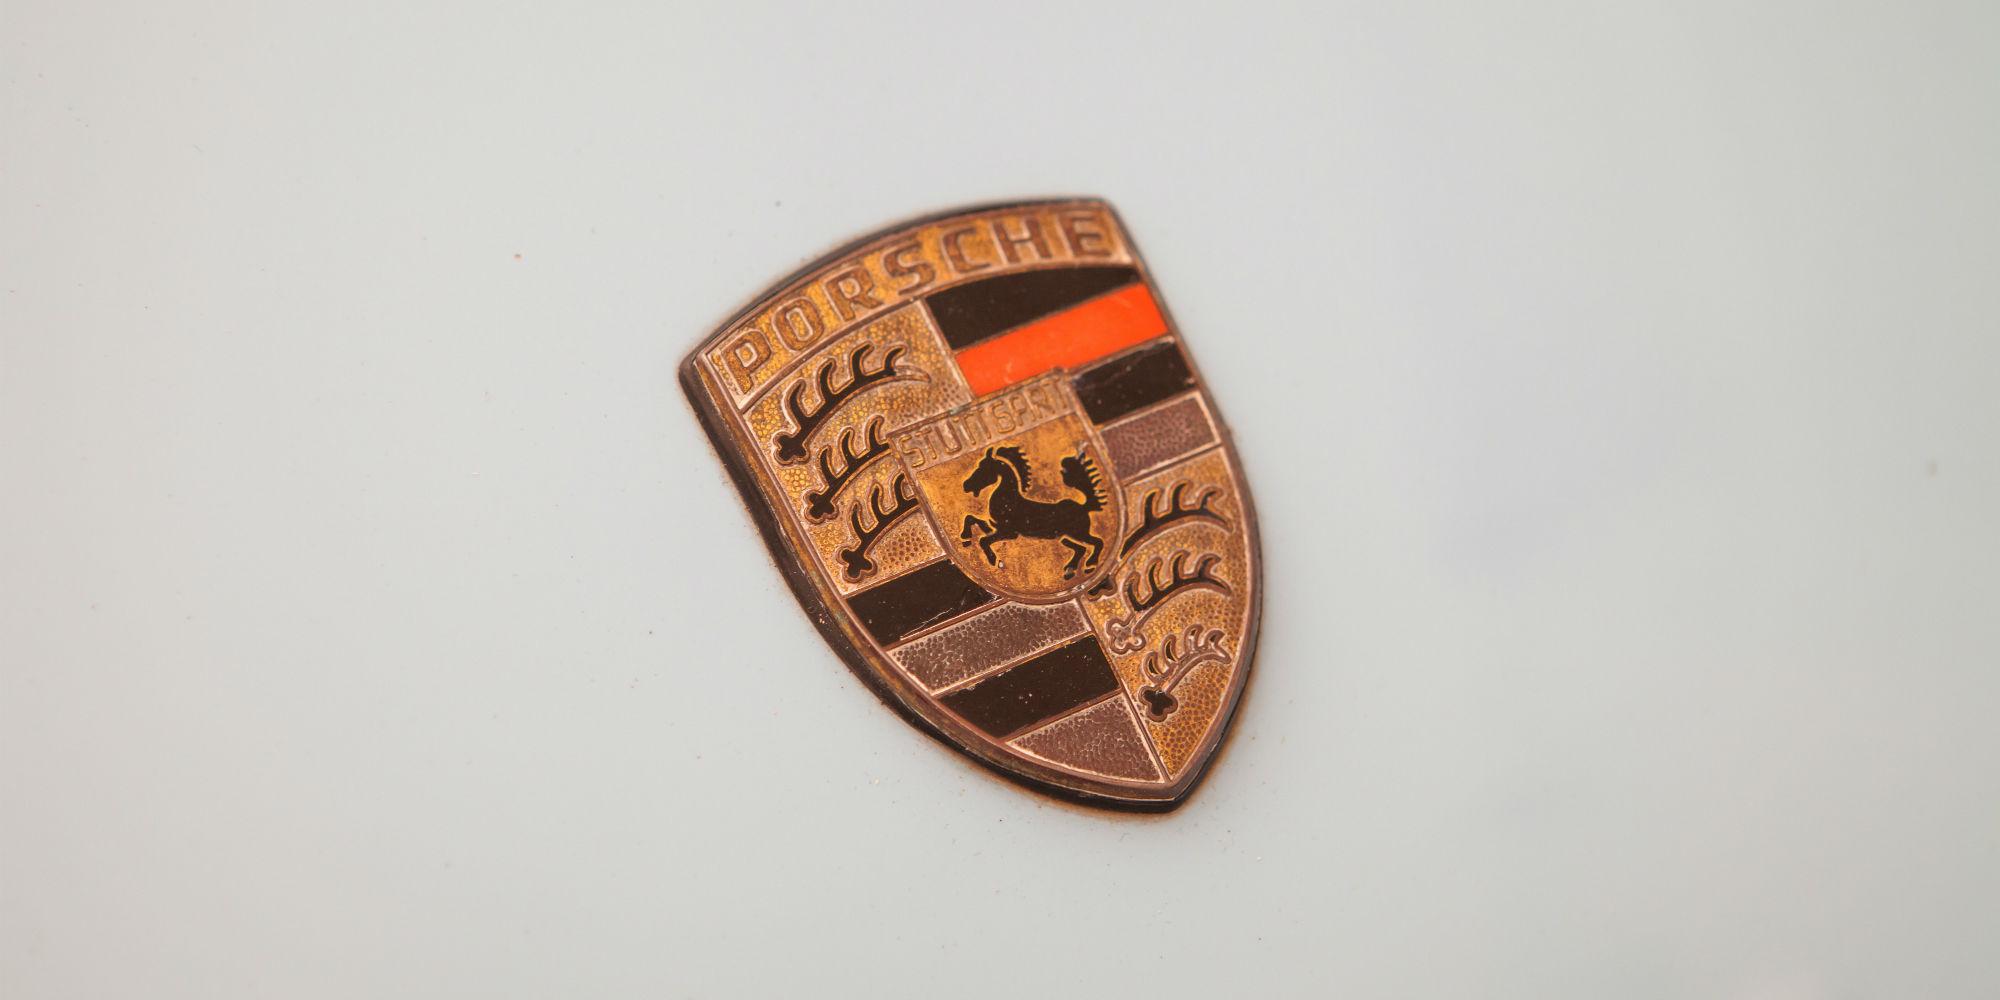 1969 Porsche 911 T to ST Specification